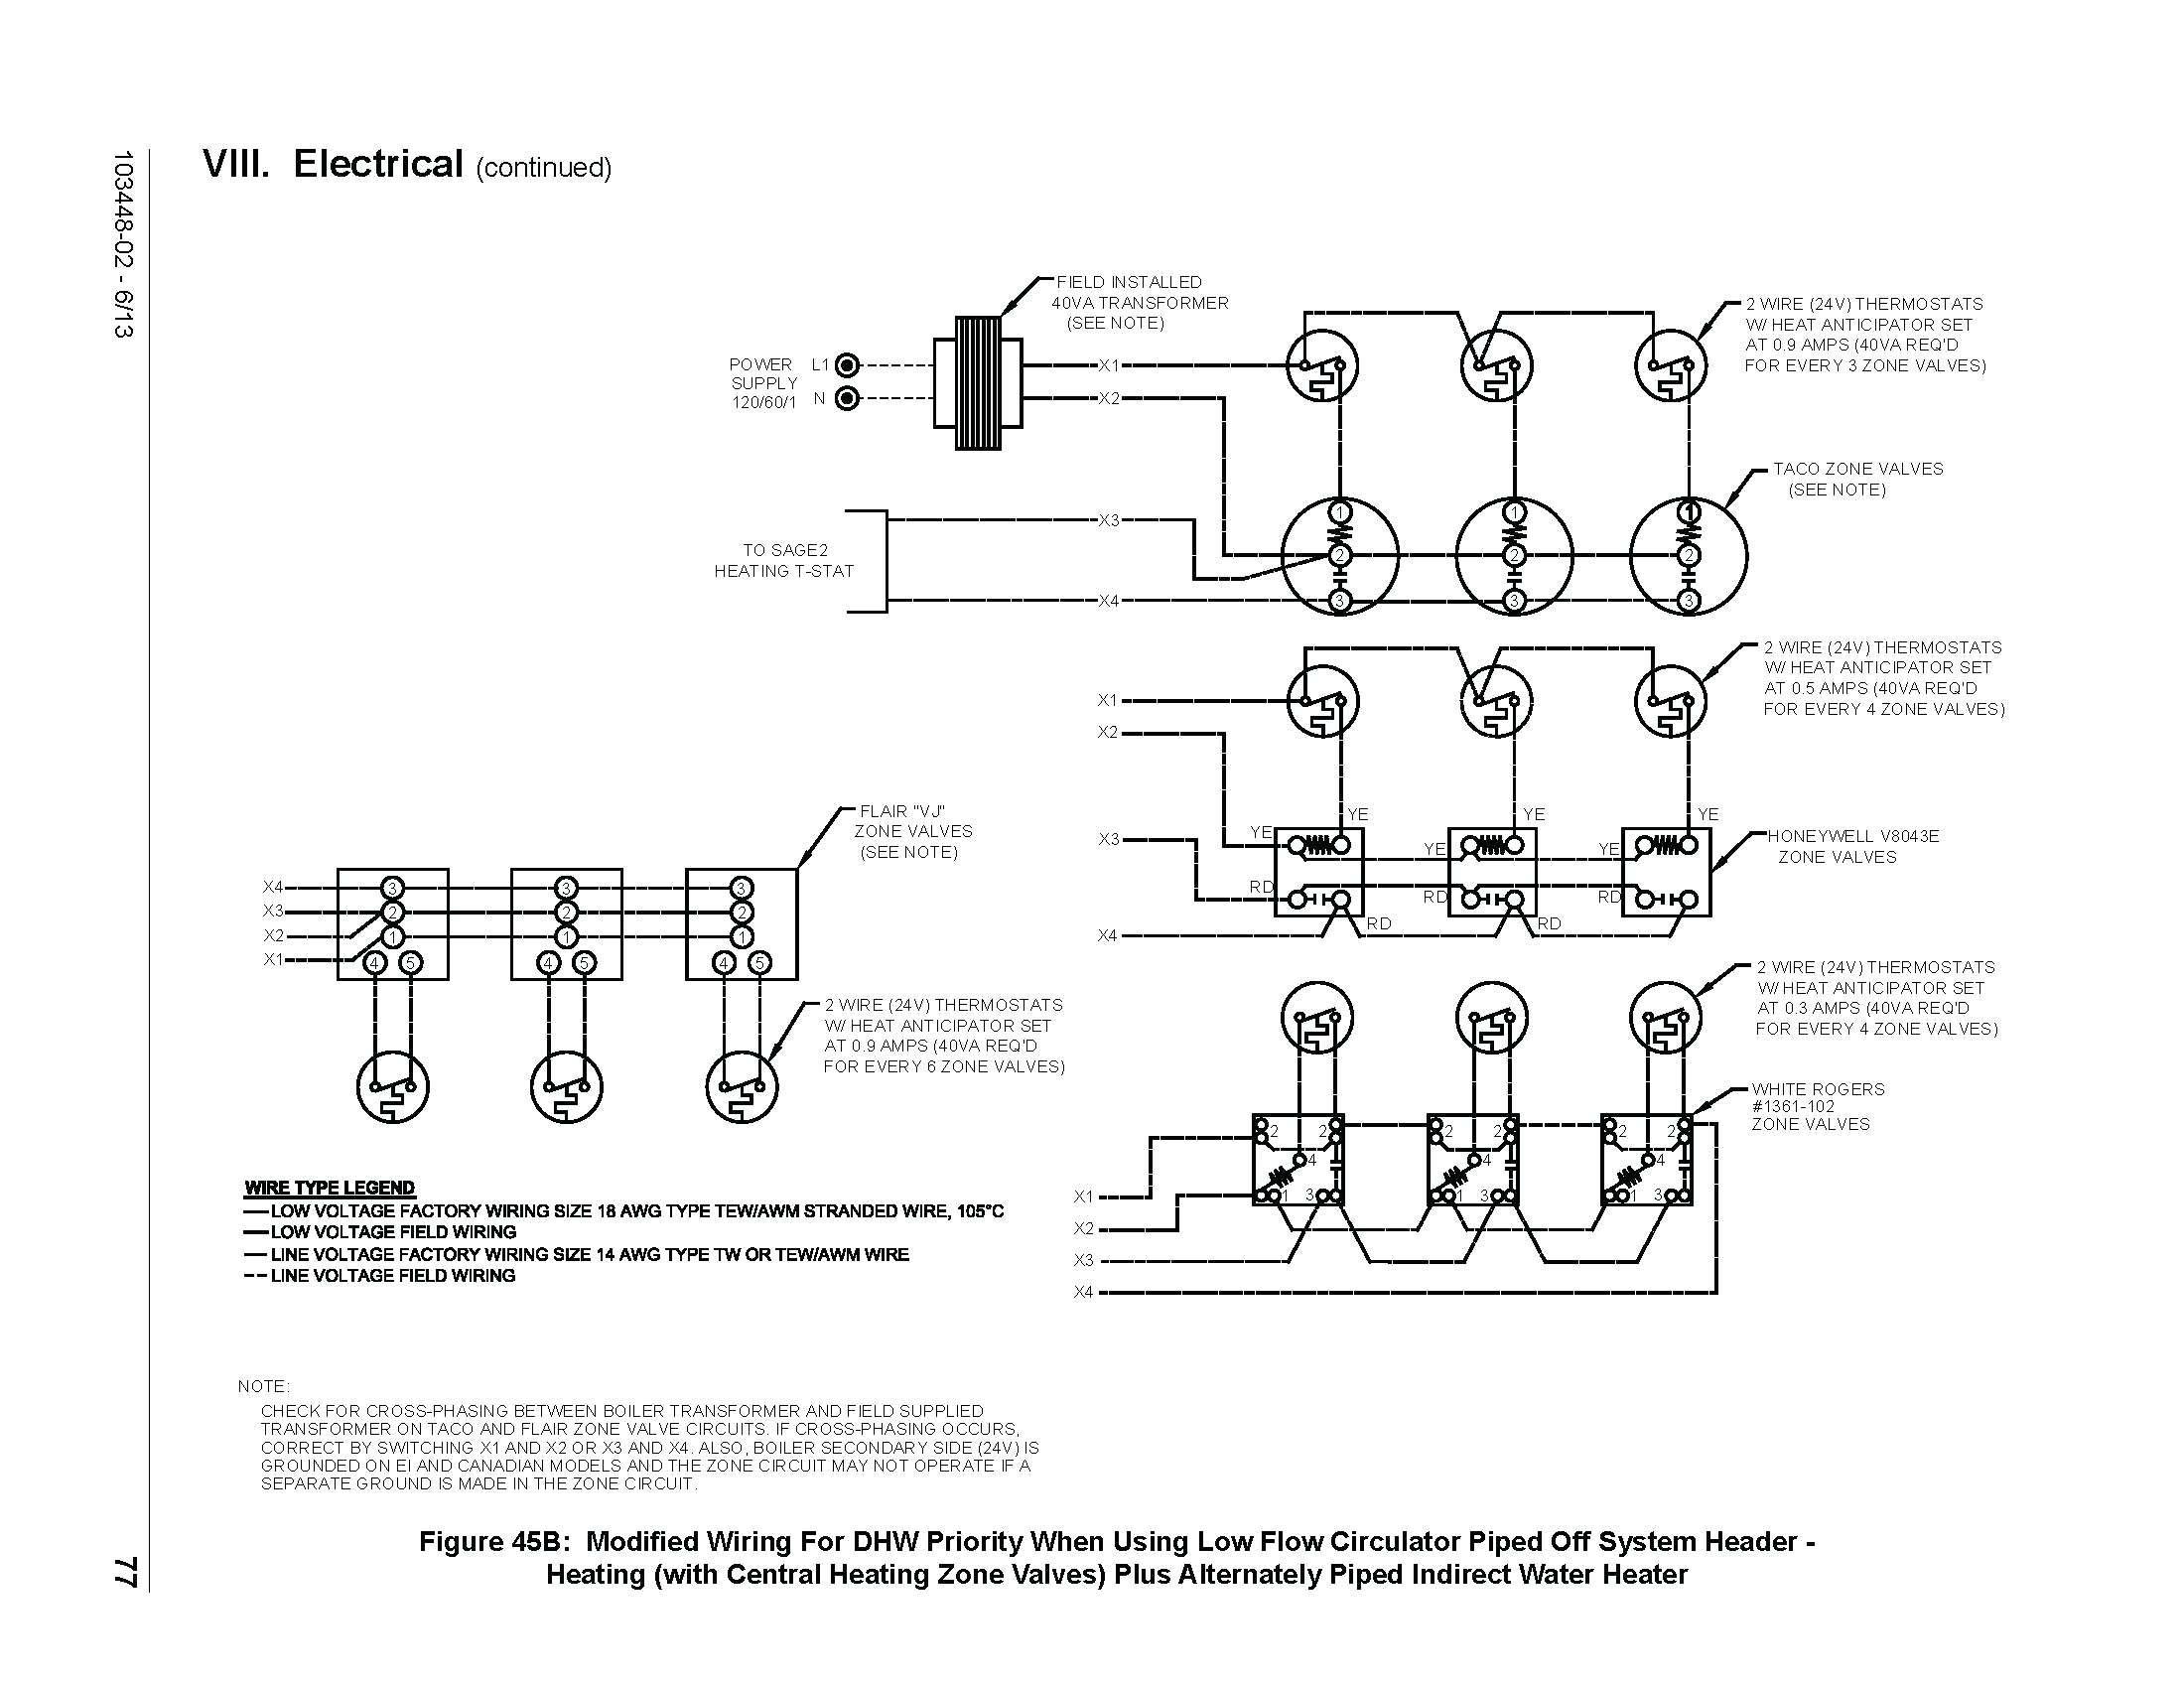 Hl 6760 Marley Baseboard Heater Wiring Diagram Wiring Diagram